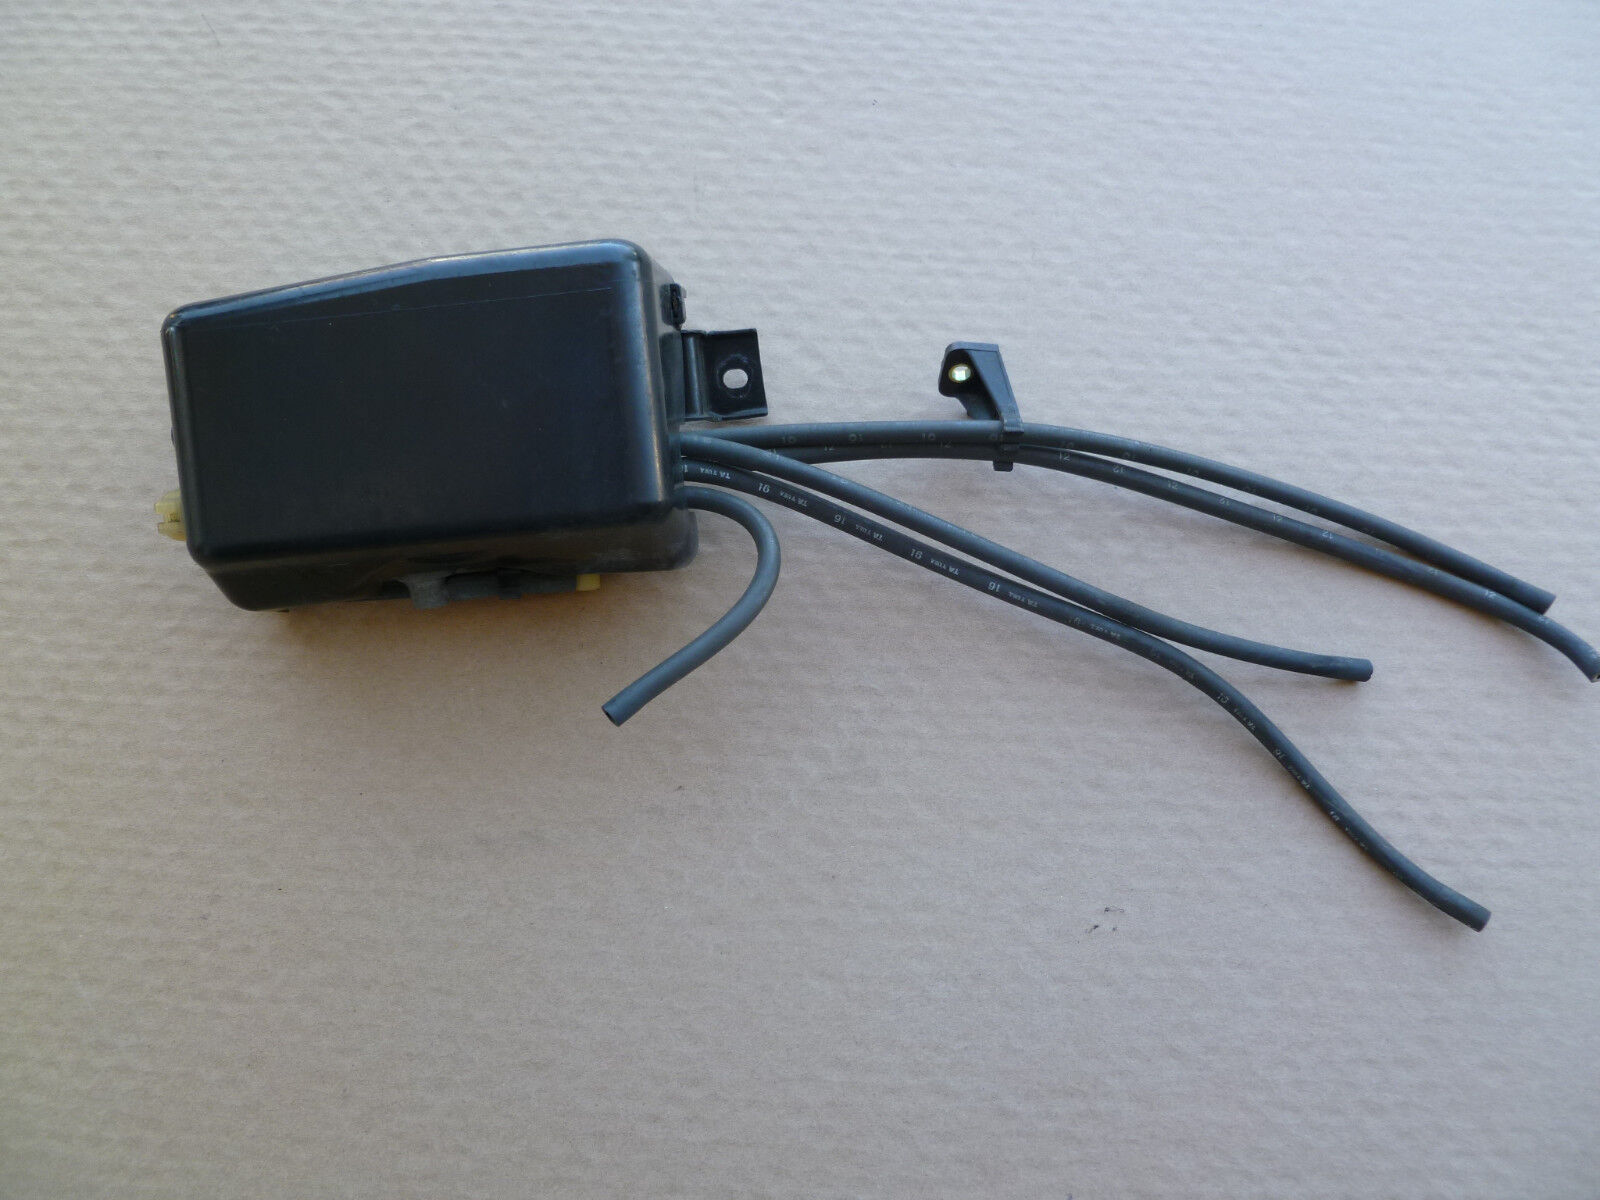 Used Honda Crx Sensors For Sale Map Sensor Wiring 1988 1991 Hf Oem Vacuum Control Unit Box Pm8 Rare